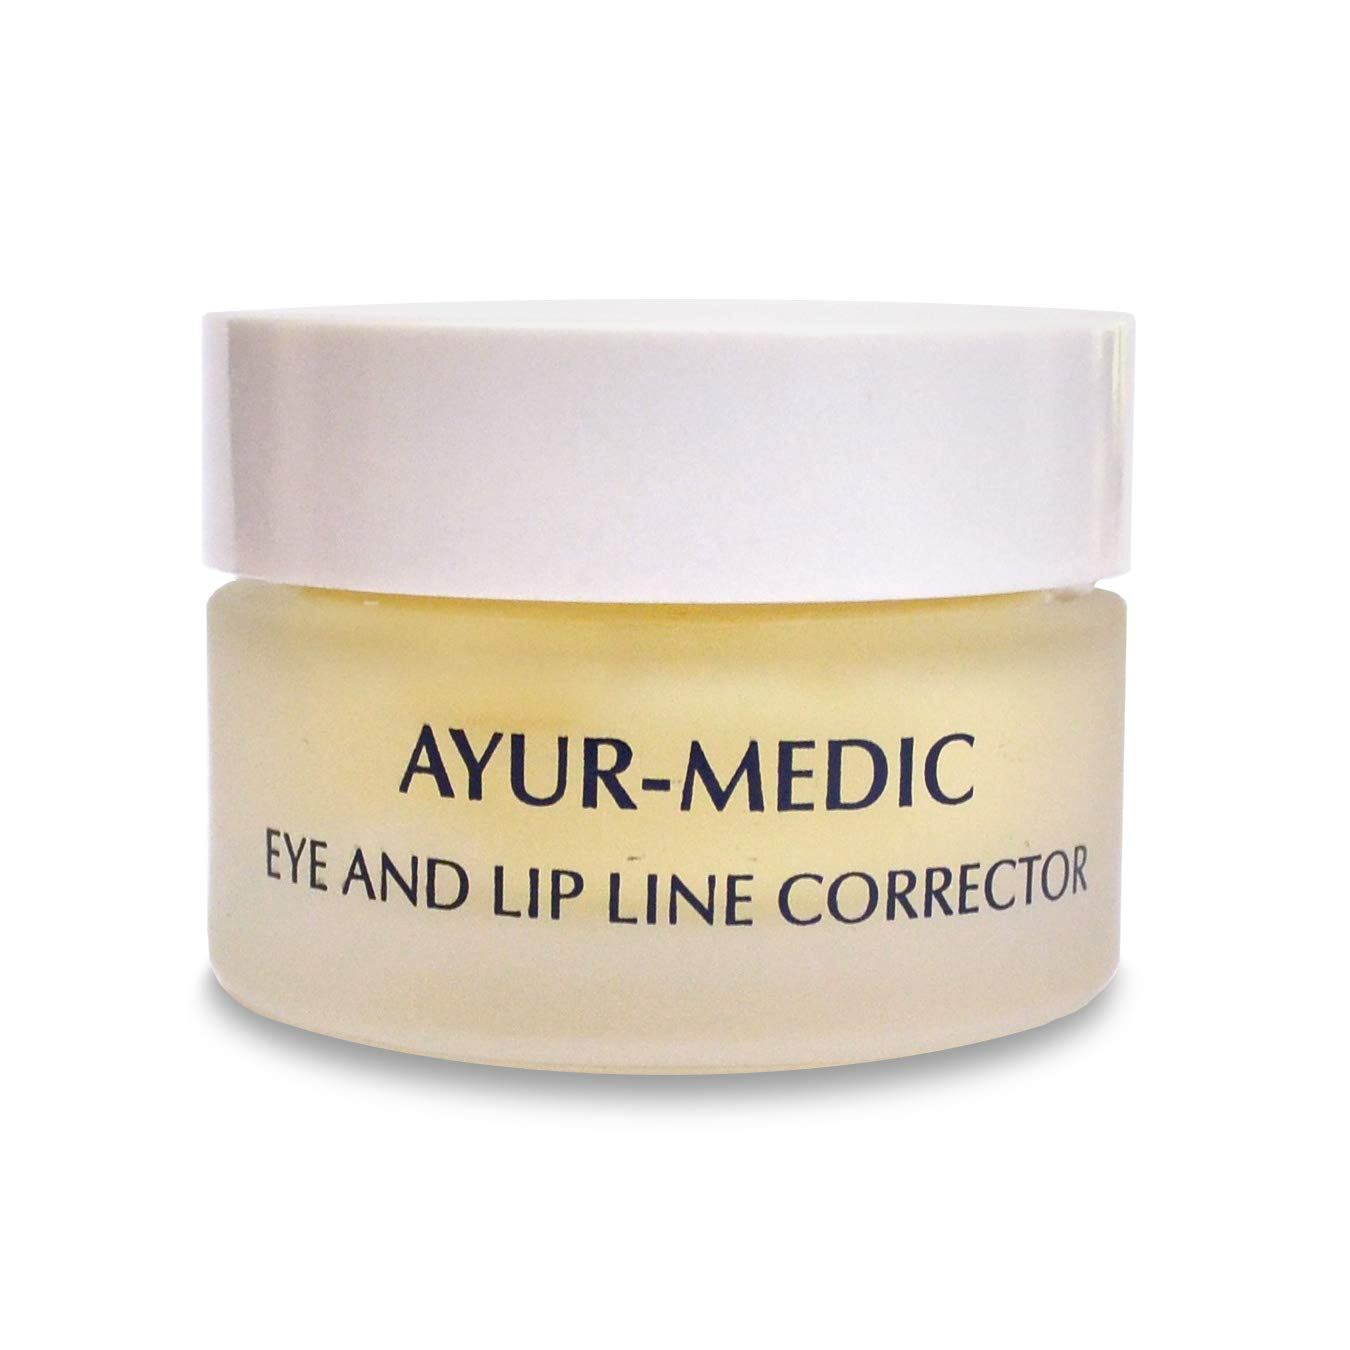 Ayur-Medic Eye And Lip Line Cream (.525 oz) by Ayur-Medic